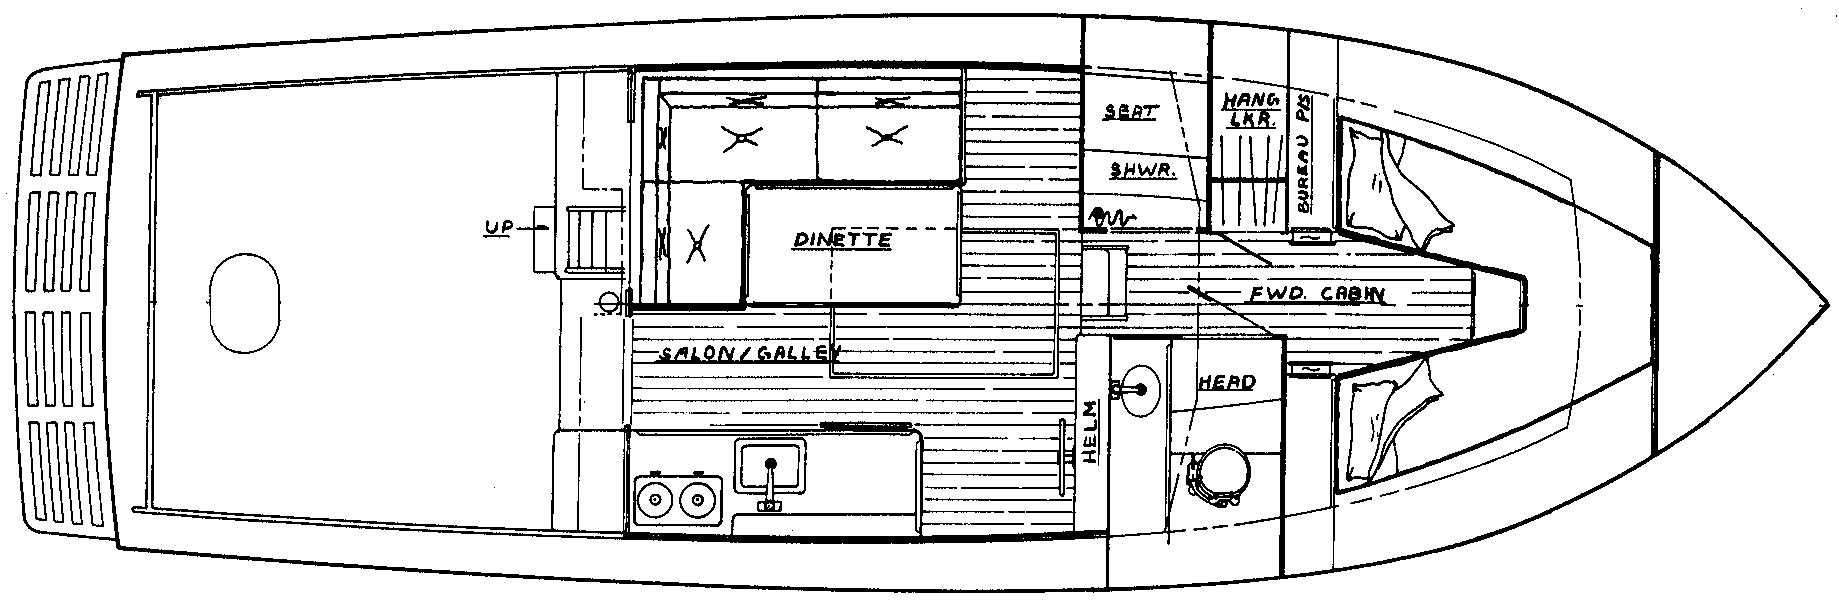 35 Flybridge Floor Plan 1